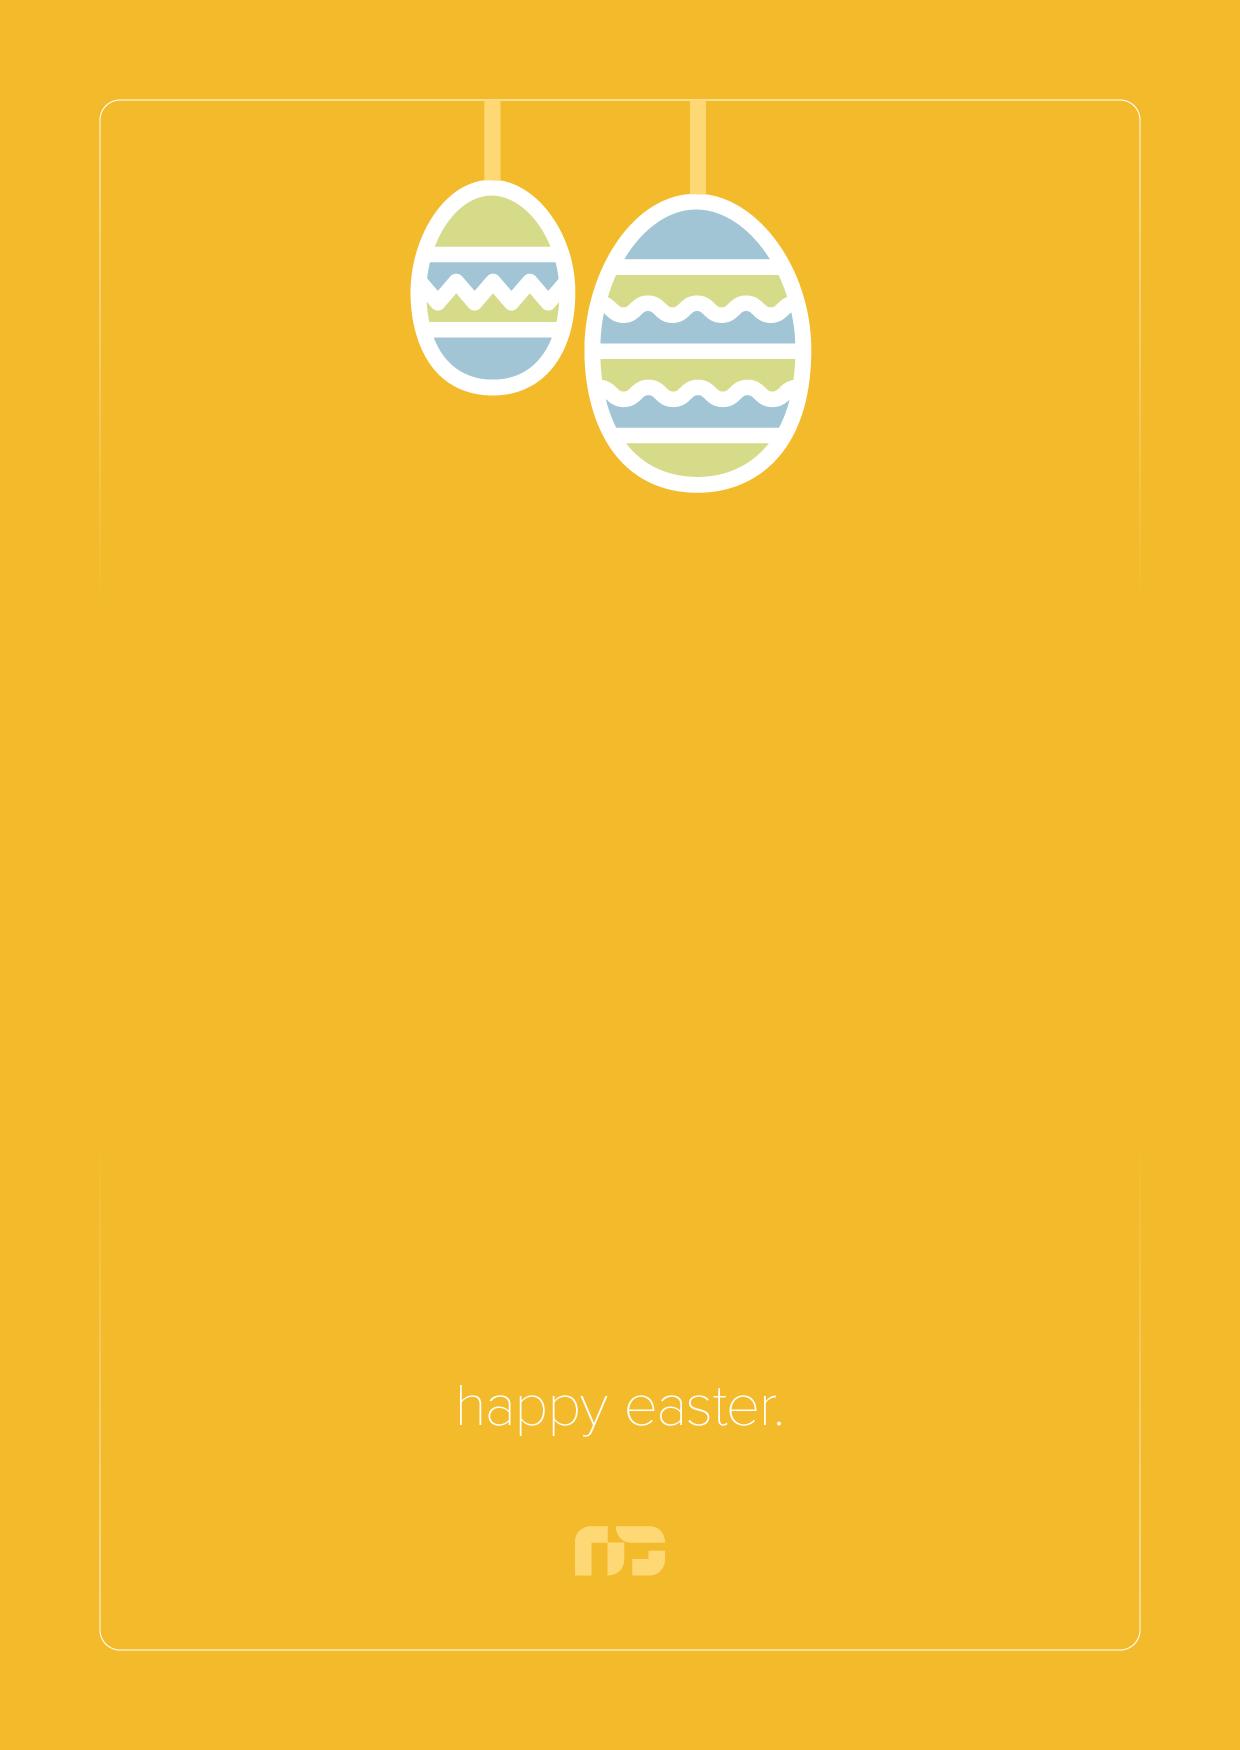 Neuro Designs Blog Easter